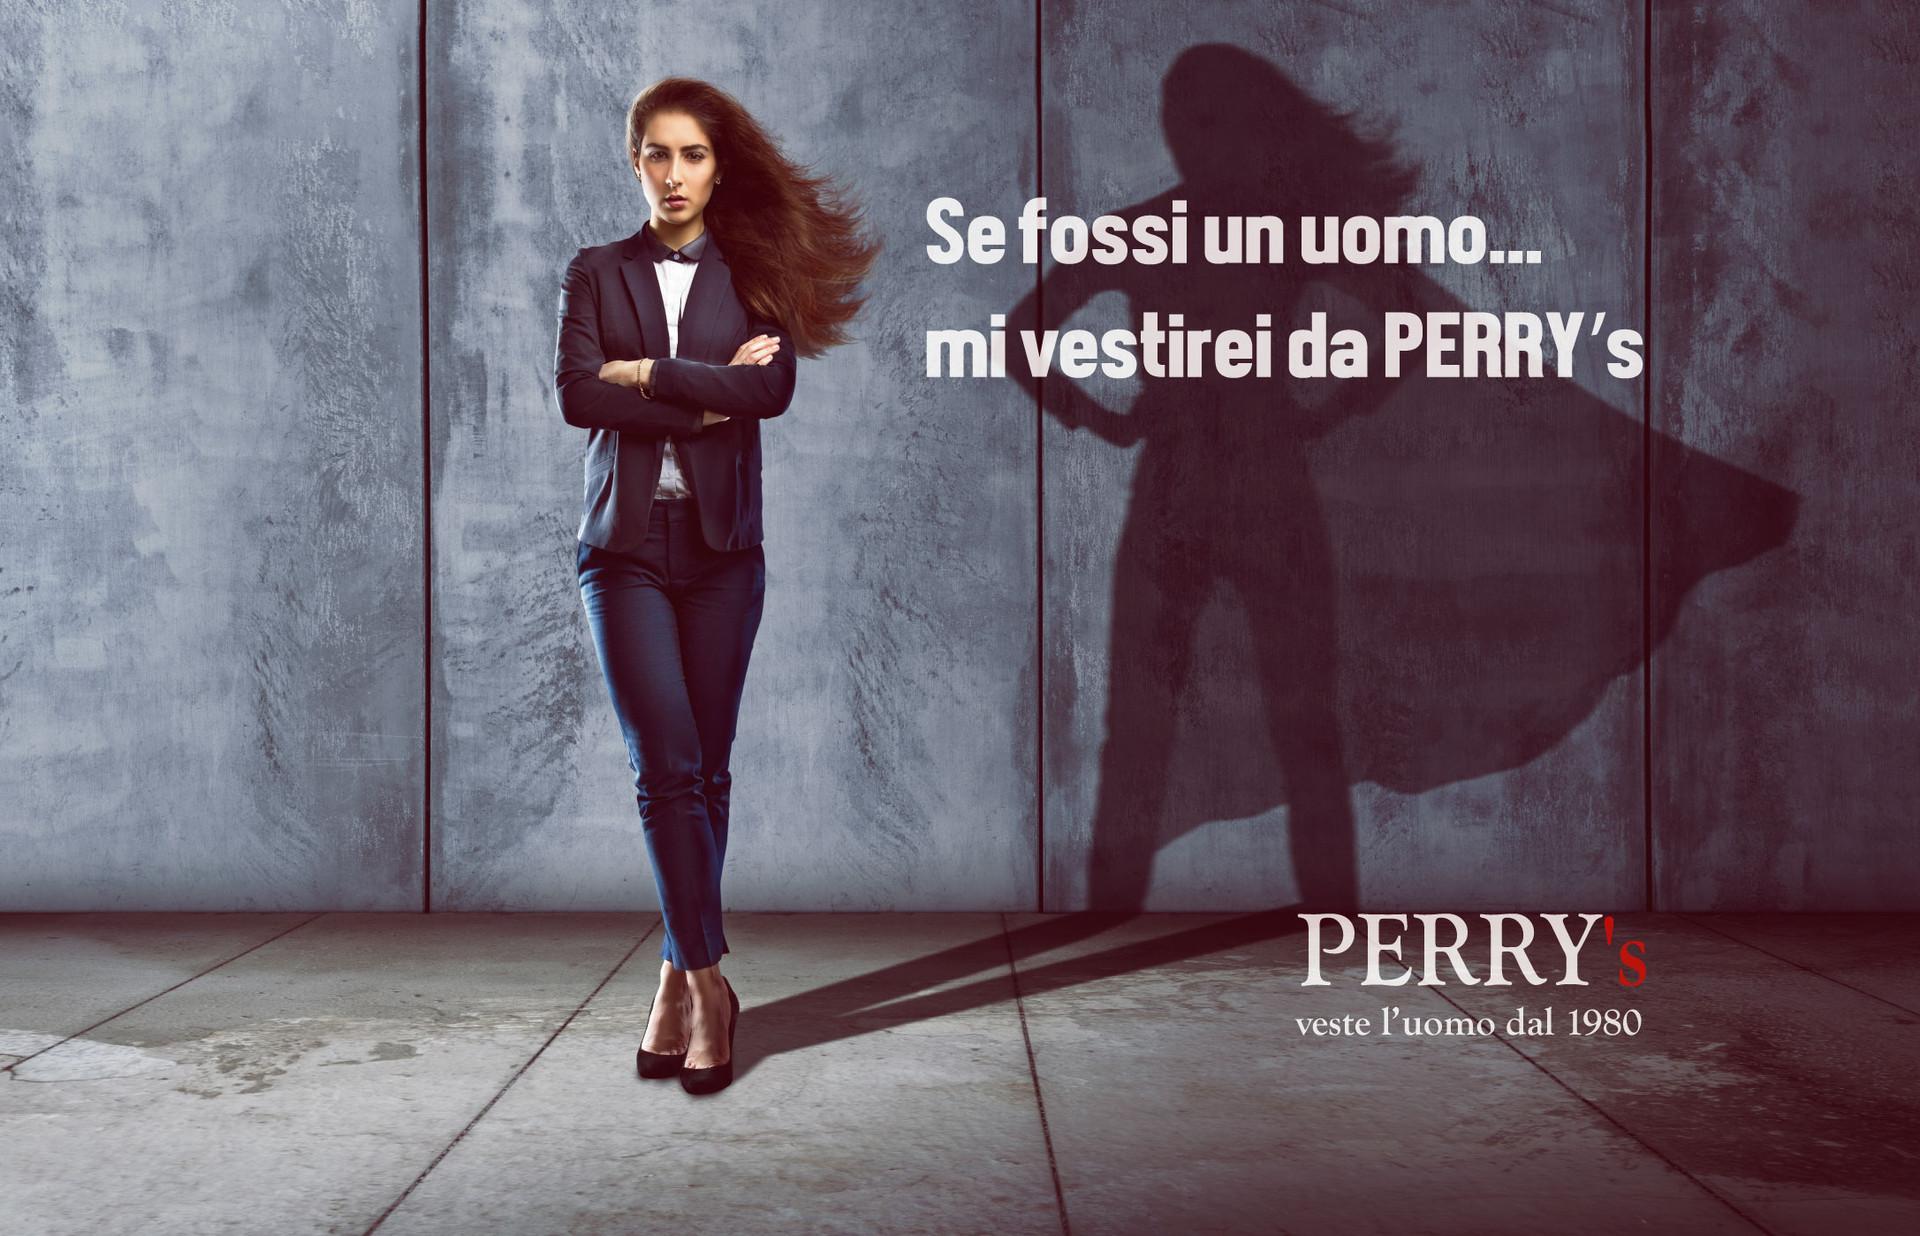 Perry-Esecutivo-web-con-testo.jpg